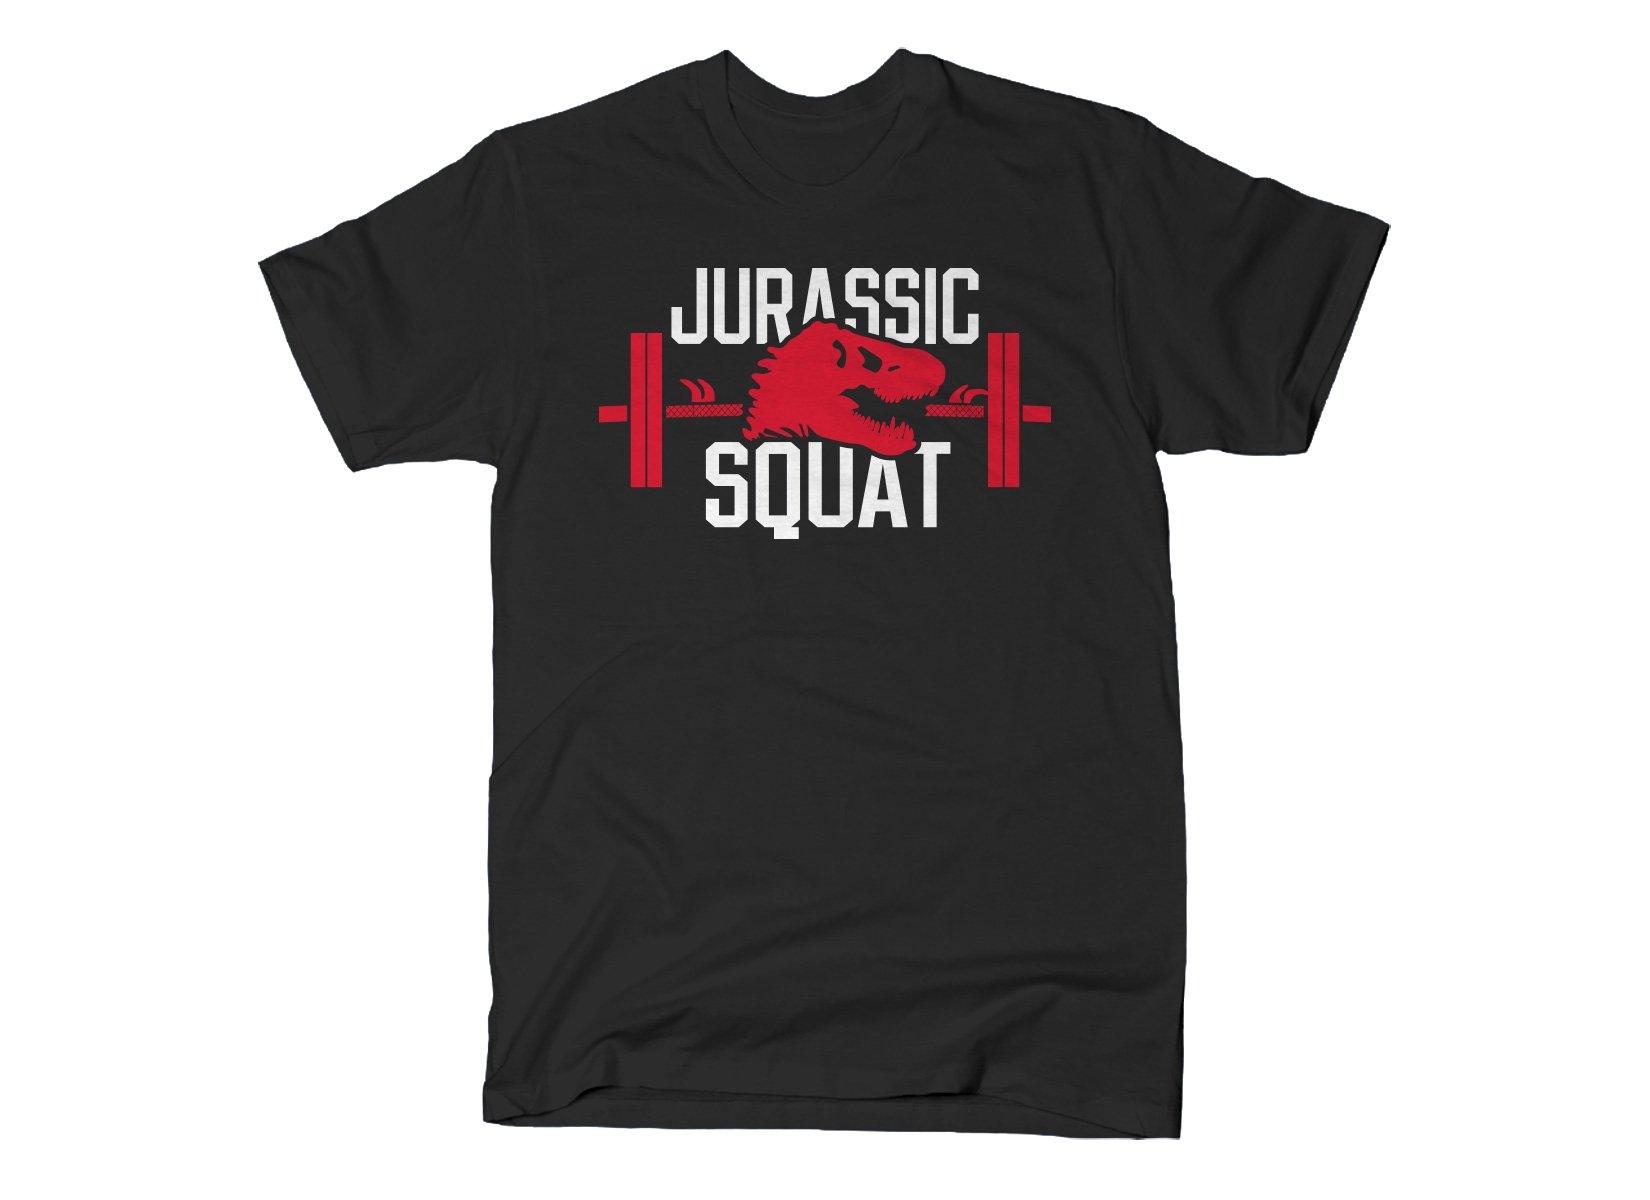 Jurassic Squat on Mens T-Shirt